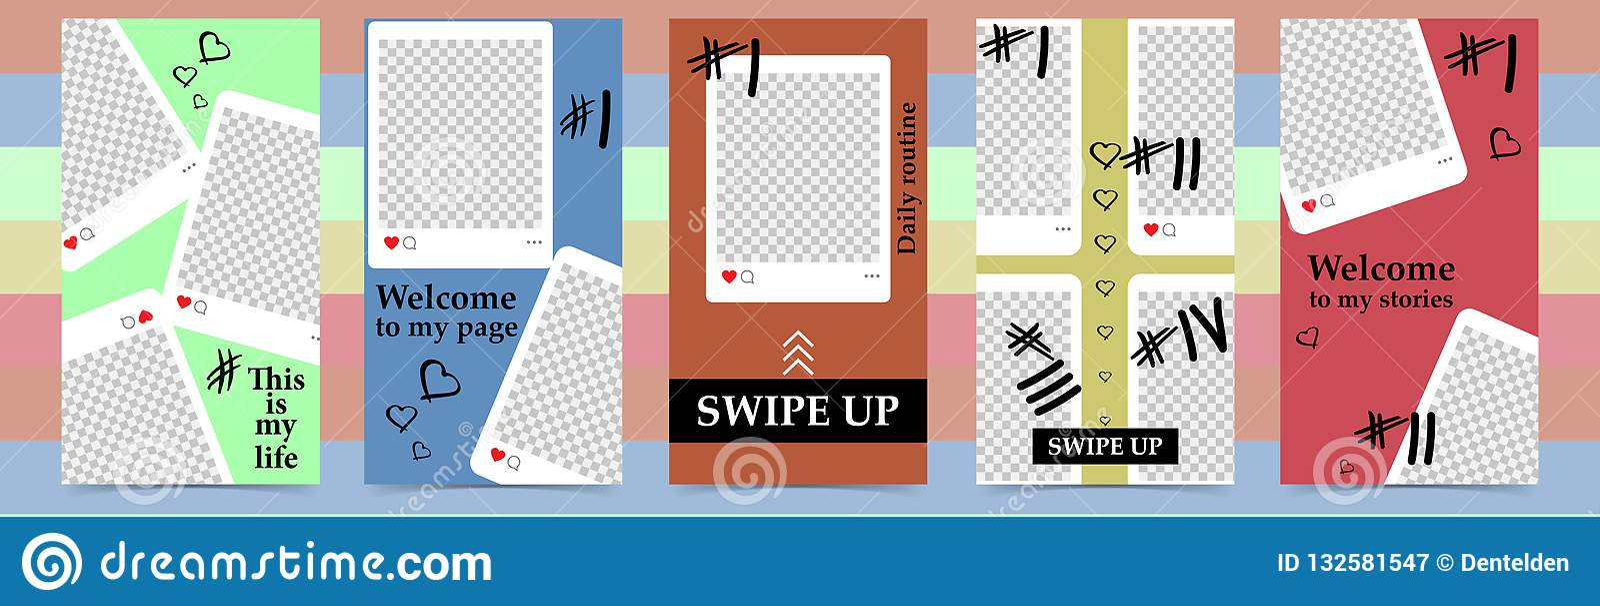 Instagram故事的,销售时髦编辑可能的模板 社会媒介的设计背景 手拉的抽象卡片